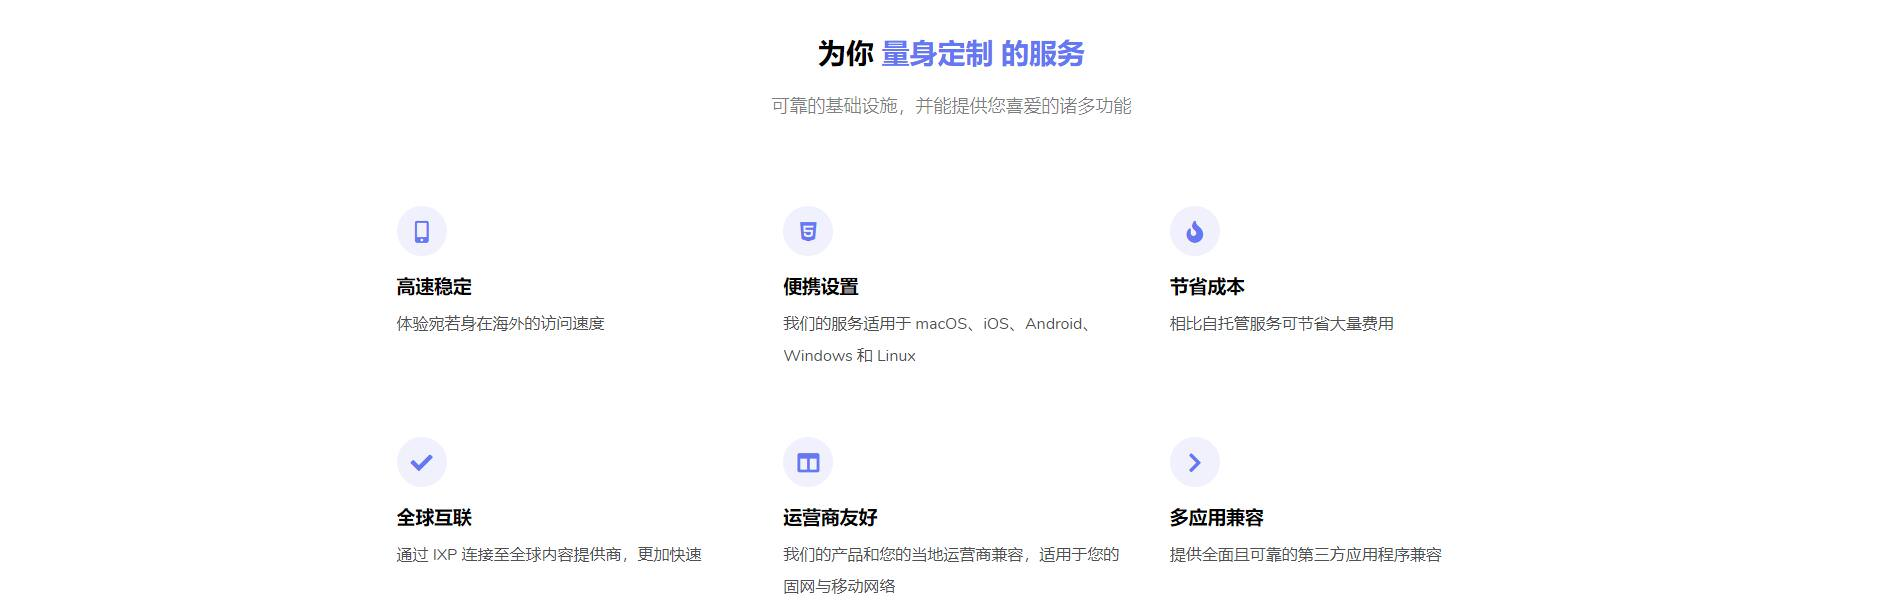 Free实现全设备、全平台全家免费翻墙!高速的VPN免费节点毫无压力科学上网!2021,值得推荐的最新翻墙利器!(关联SSR/SS/V2RAY/Trojan)